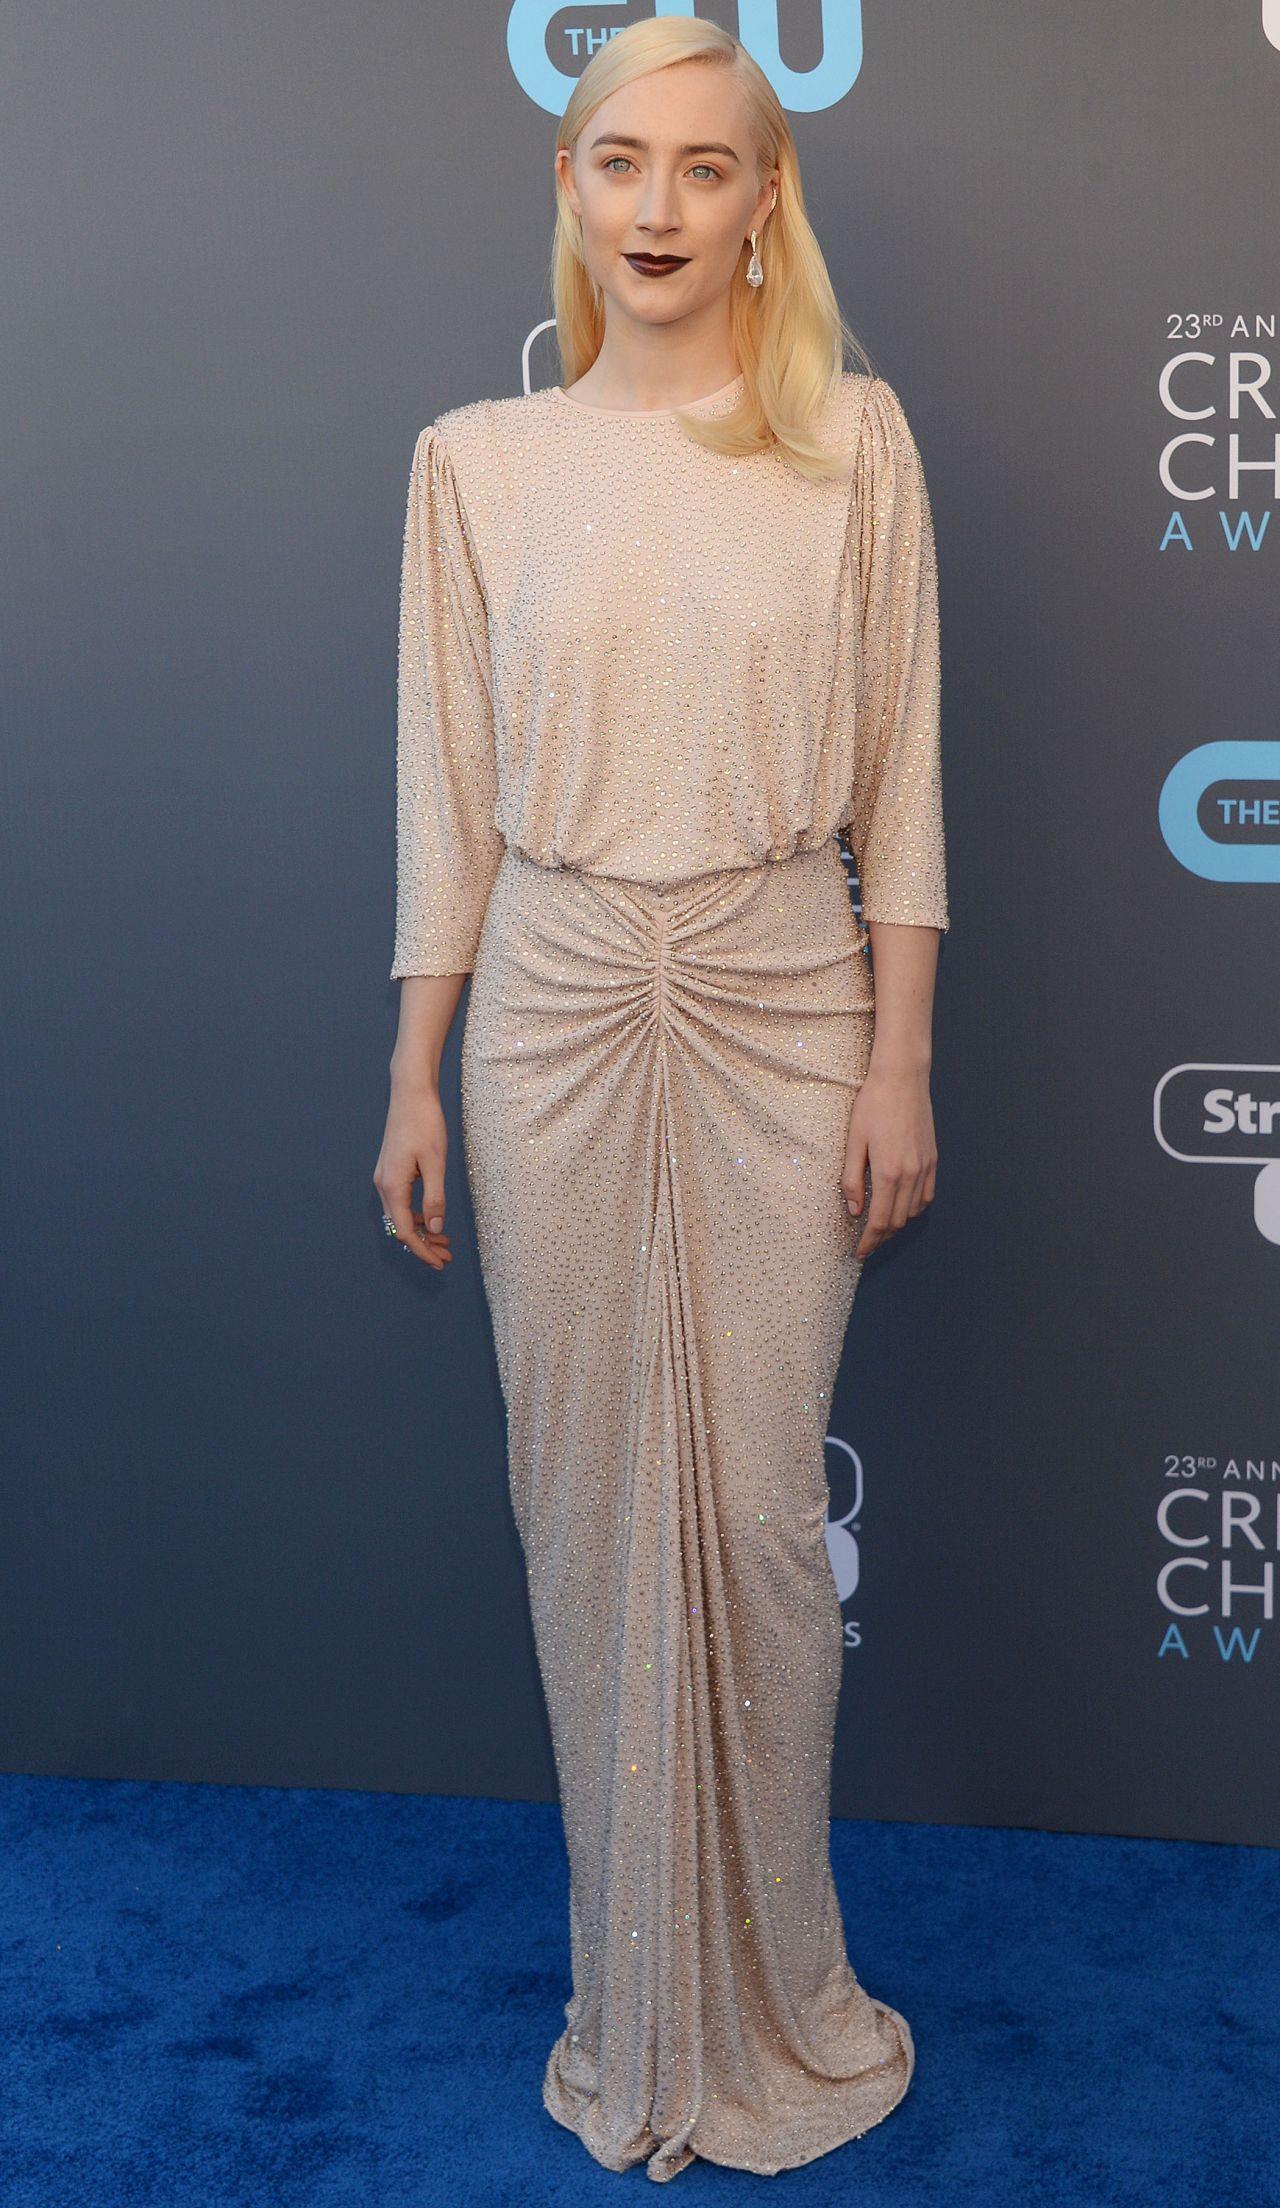 http://celebmafia.com/wp-content/uploads/2018/01/saoirse-ronan-2018-critics-choice-awards-1.jpg